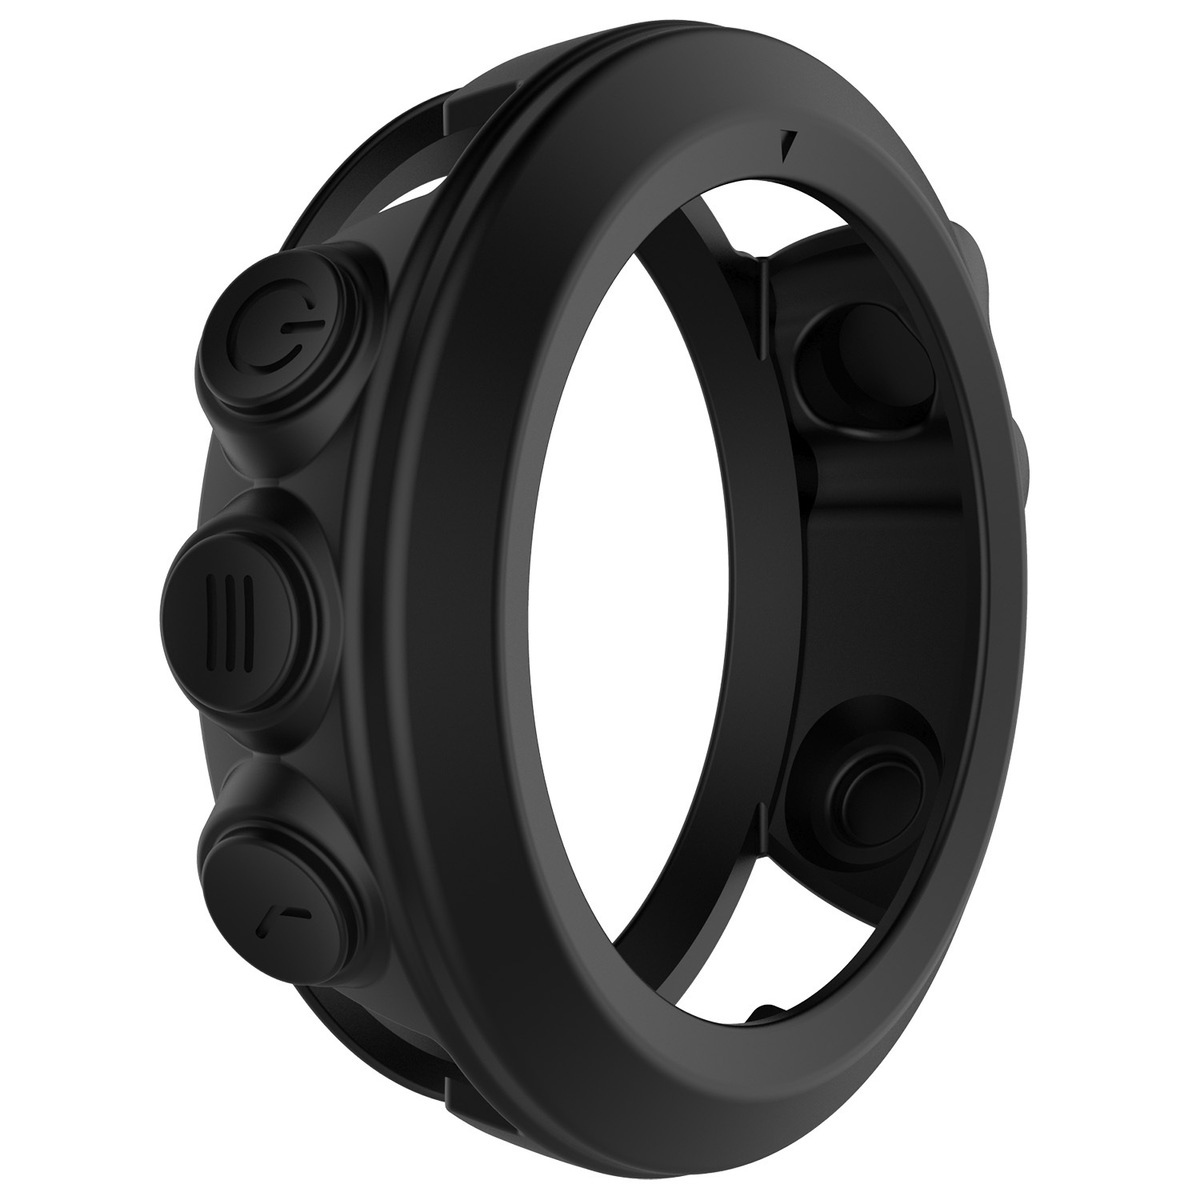 Soft Silicone Protective Case Protector Sleeve For Garmin Fenix 3 HR/Fenix 3/Fenix 3 Sapphire/Quatix 3/Tactix Bravo Band Cover